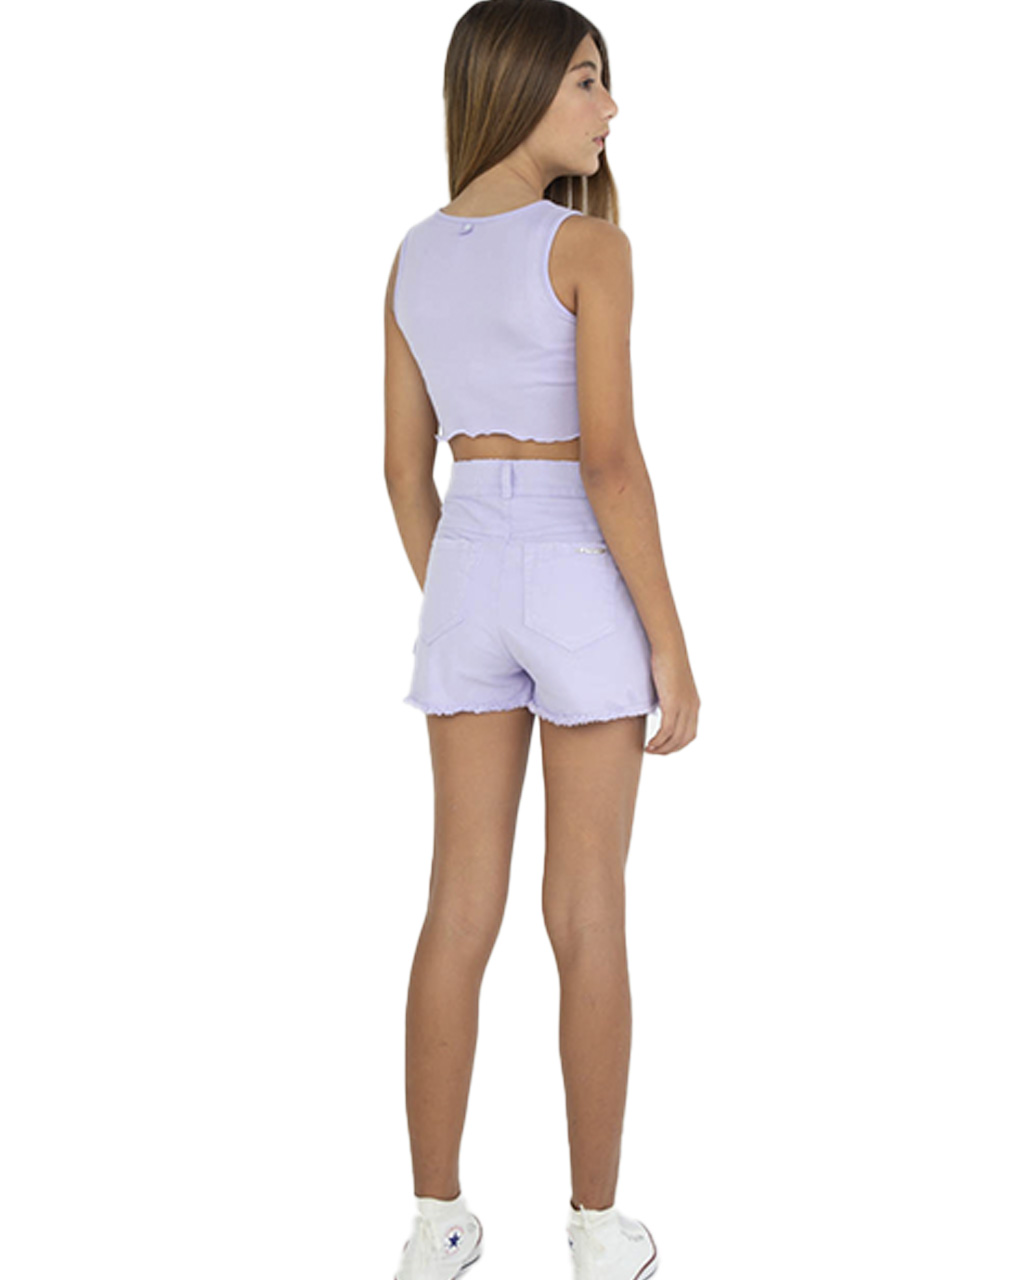 Shorts Saia Teen com Transpasse Roxo Dimy Candy